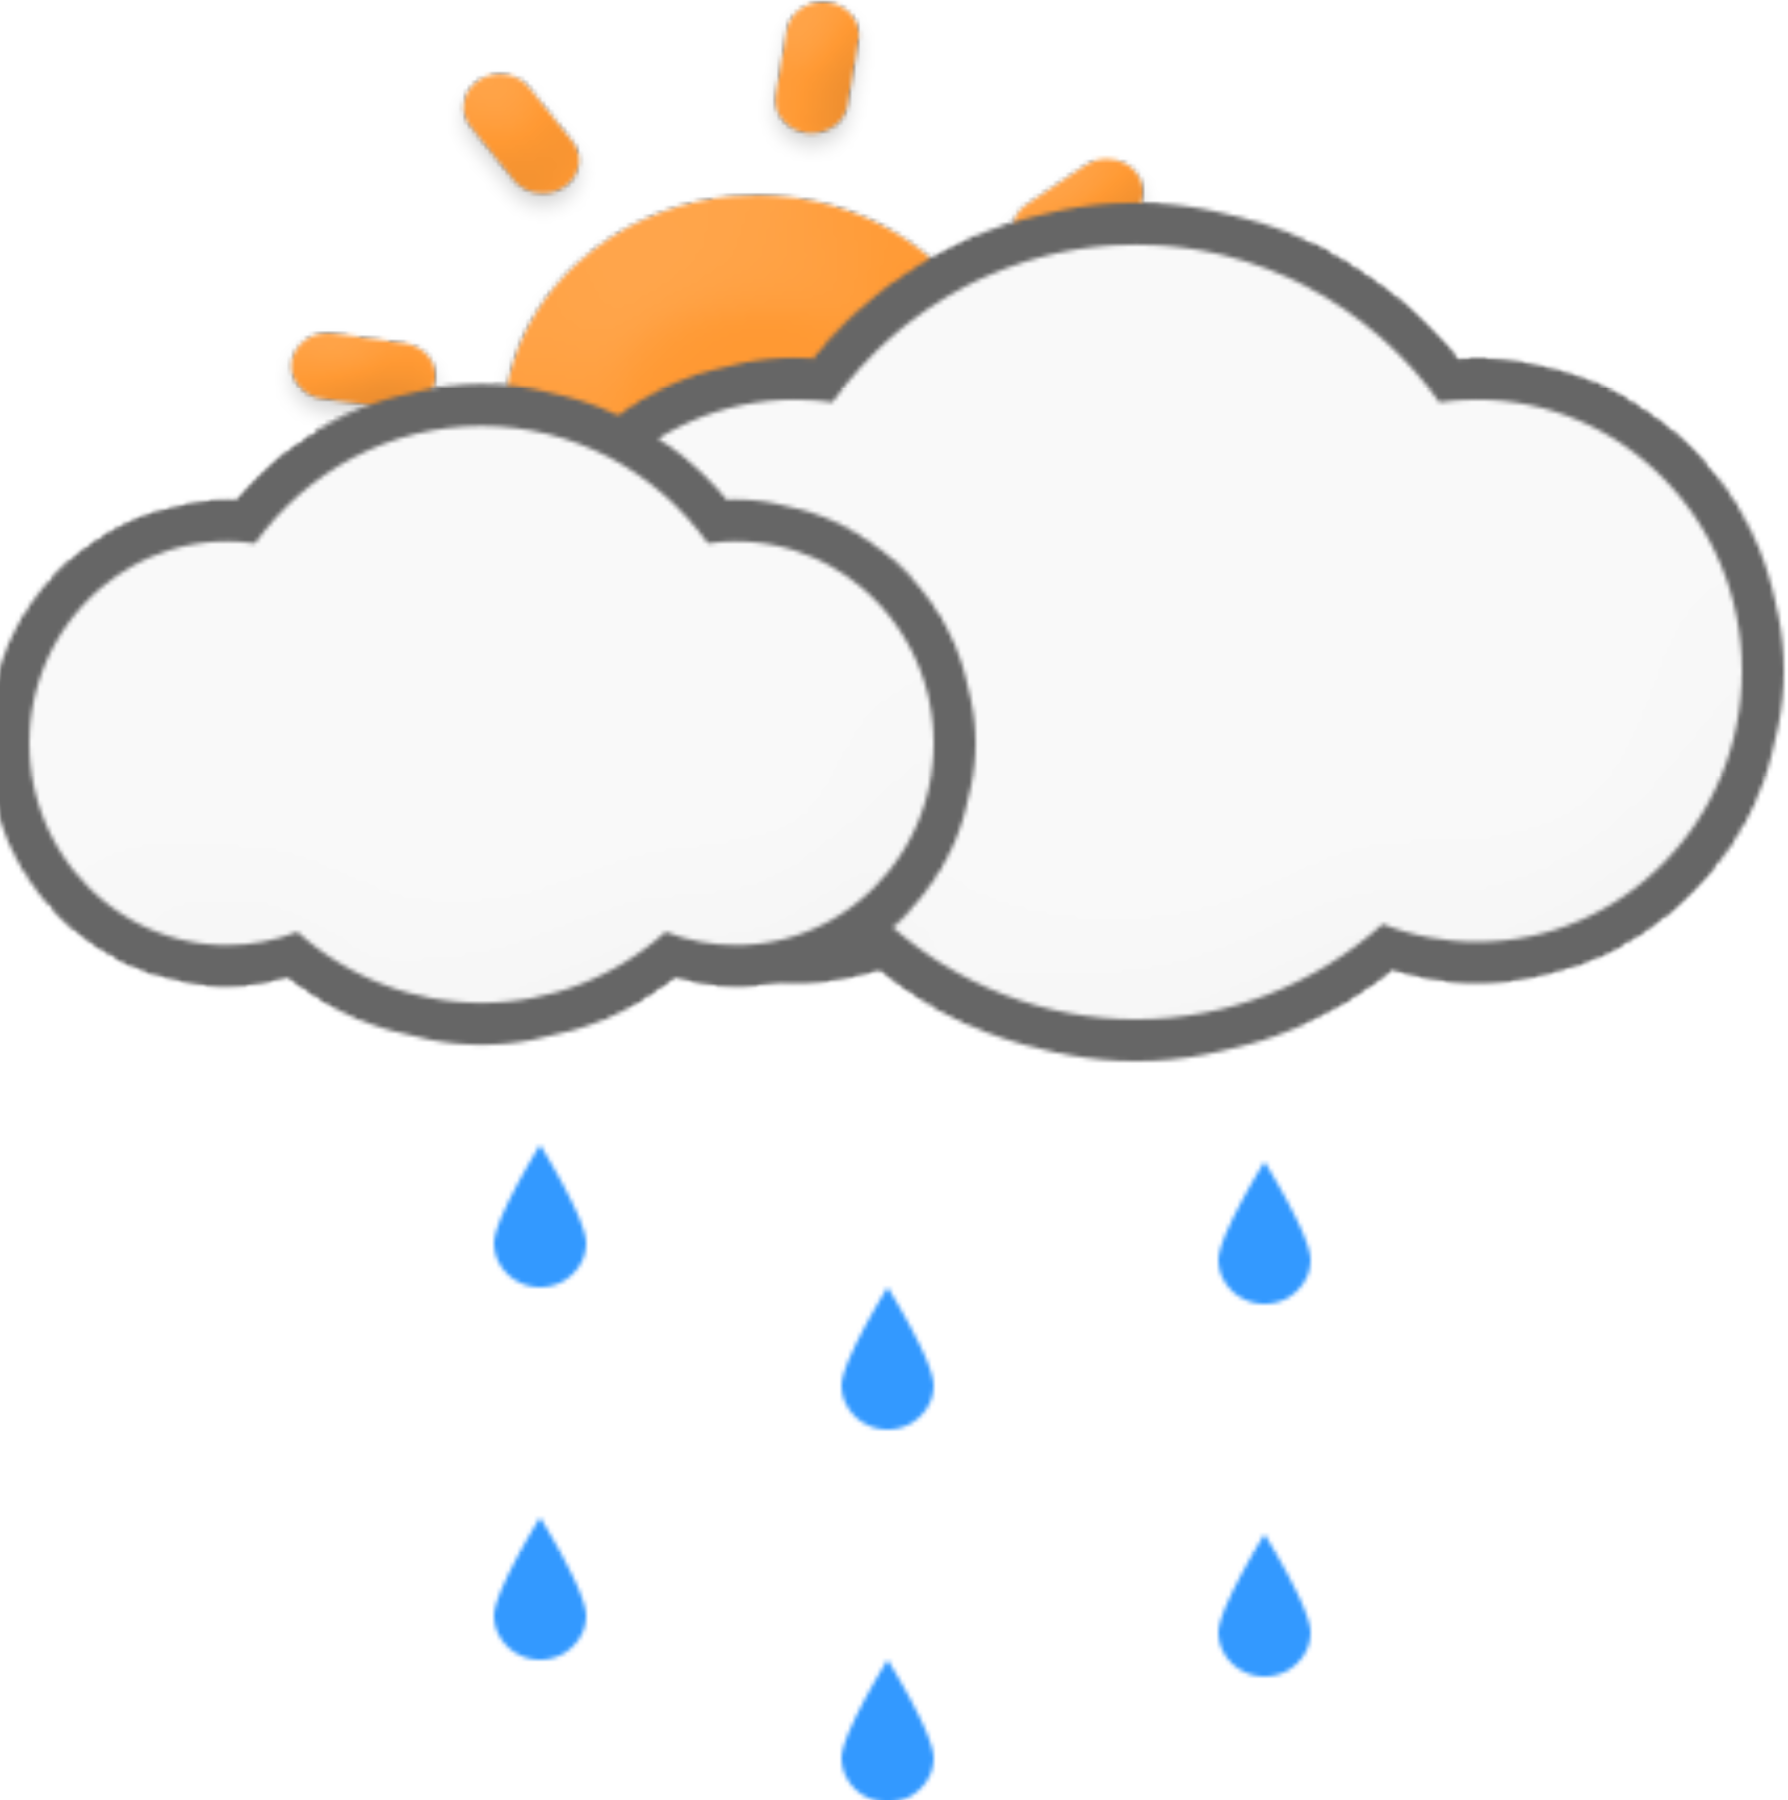 Mexico riviera maya clipart png clip art free download Riviera Maya Weather Forecast, Mexico - Holiday Weather clip art free download